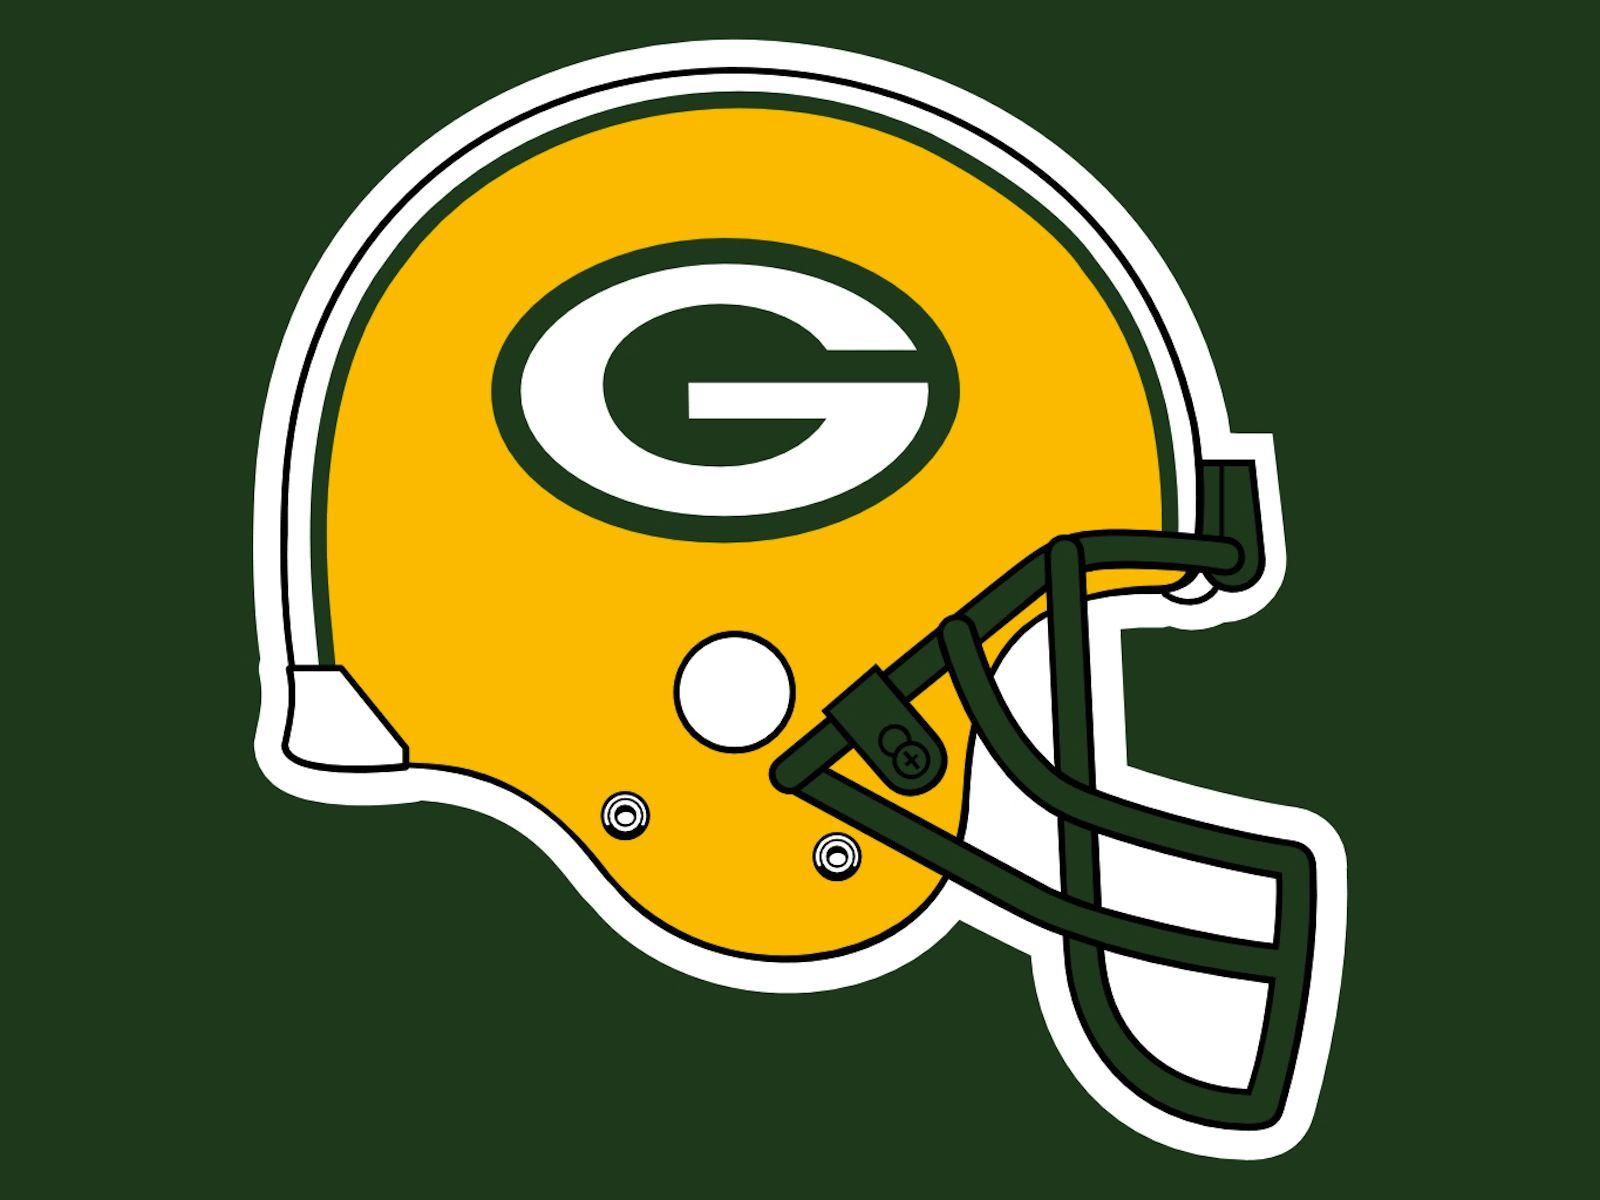 Green Bay Packers Helmet Hd Wallpaper Wallpaper Details Green Bay Packers Helmet Green Bay Packers Pictures Green Bay Packers Football